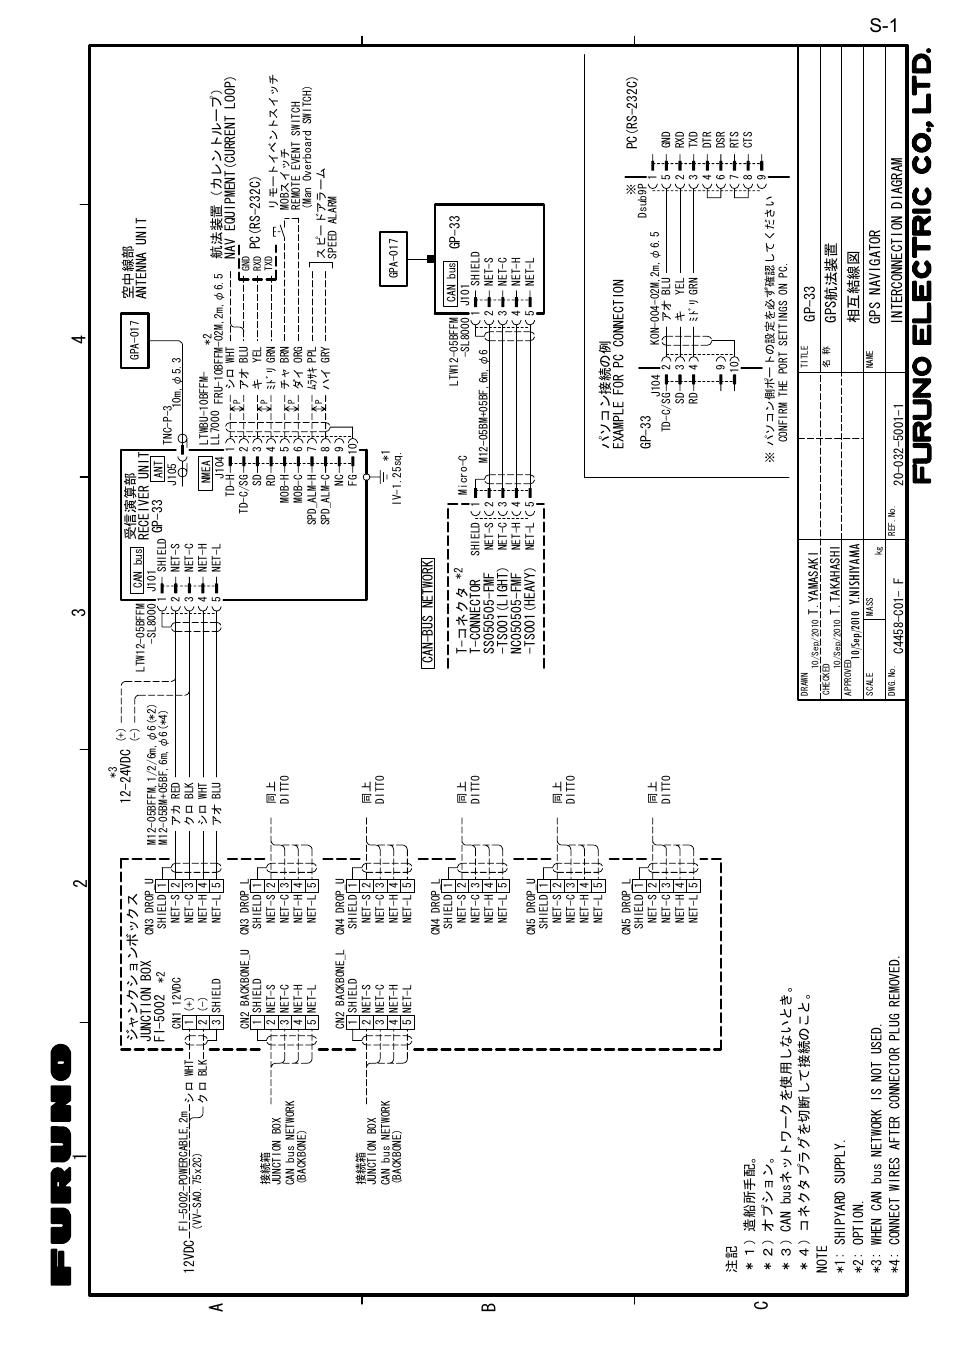 medium resolution of interconnection diagram y nishiyama furuno gp 33 user manual page 94